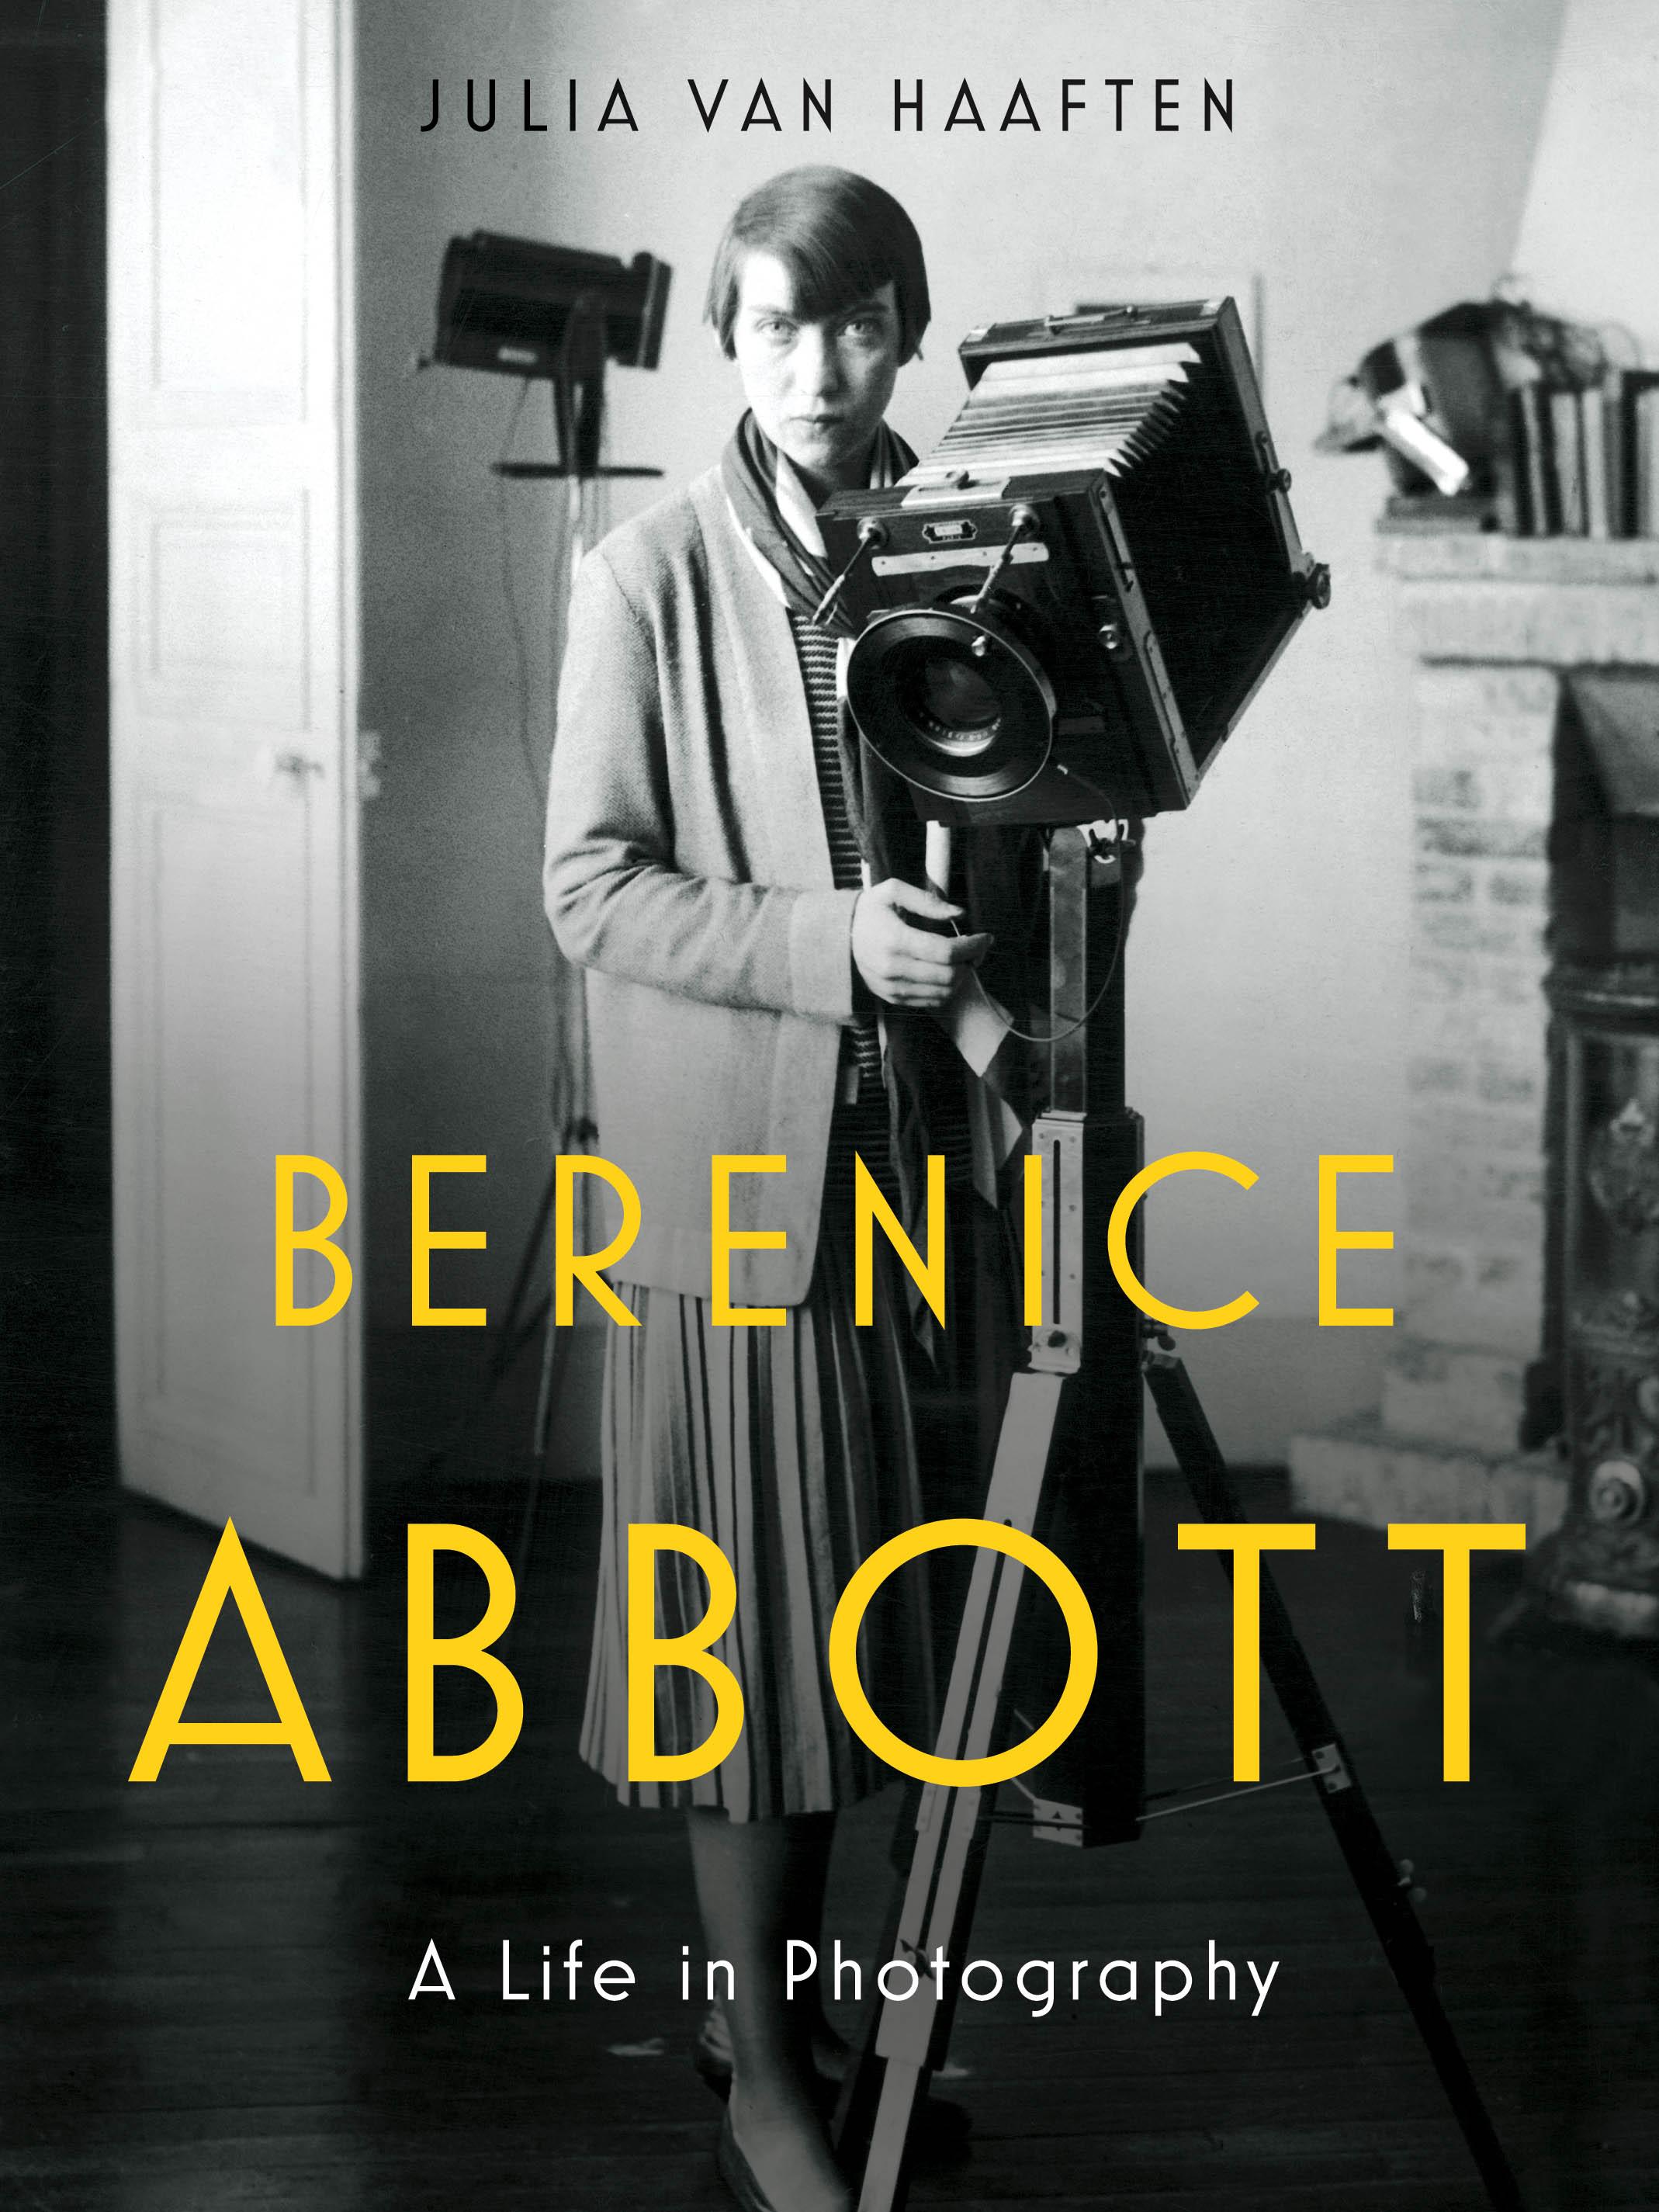 Berenice Abbott, Berenice Abbott A life in photography